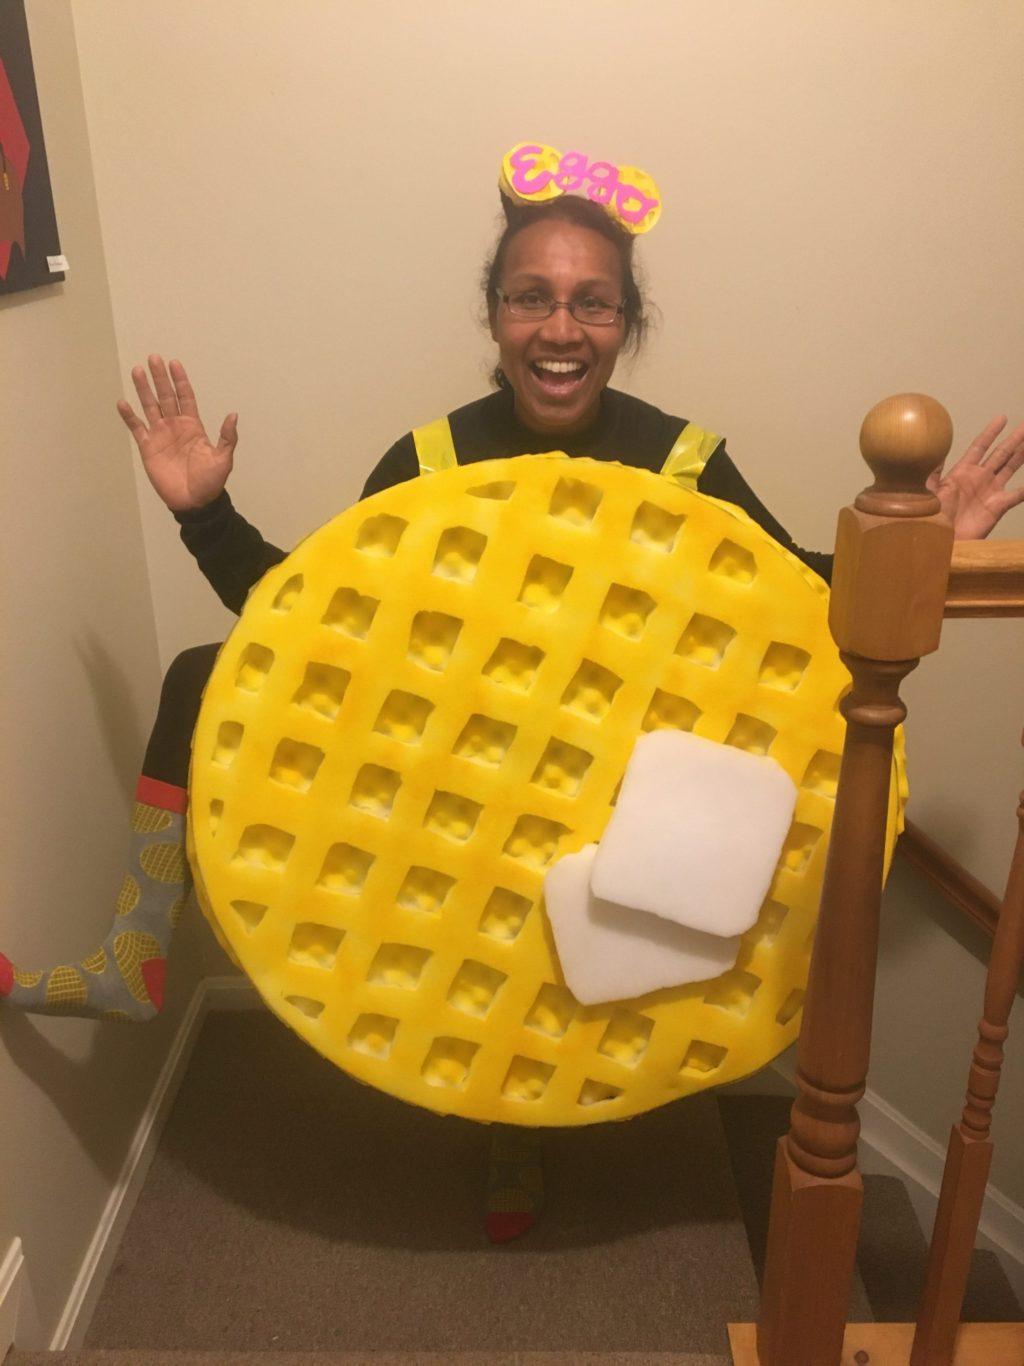 Sandy Eggo Waffle